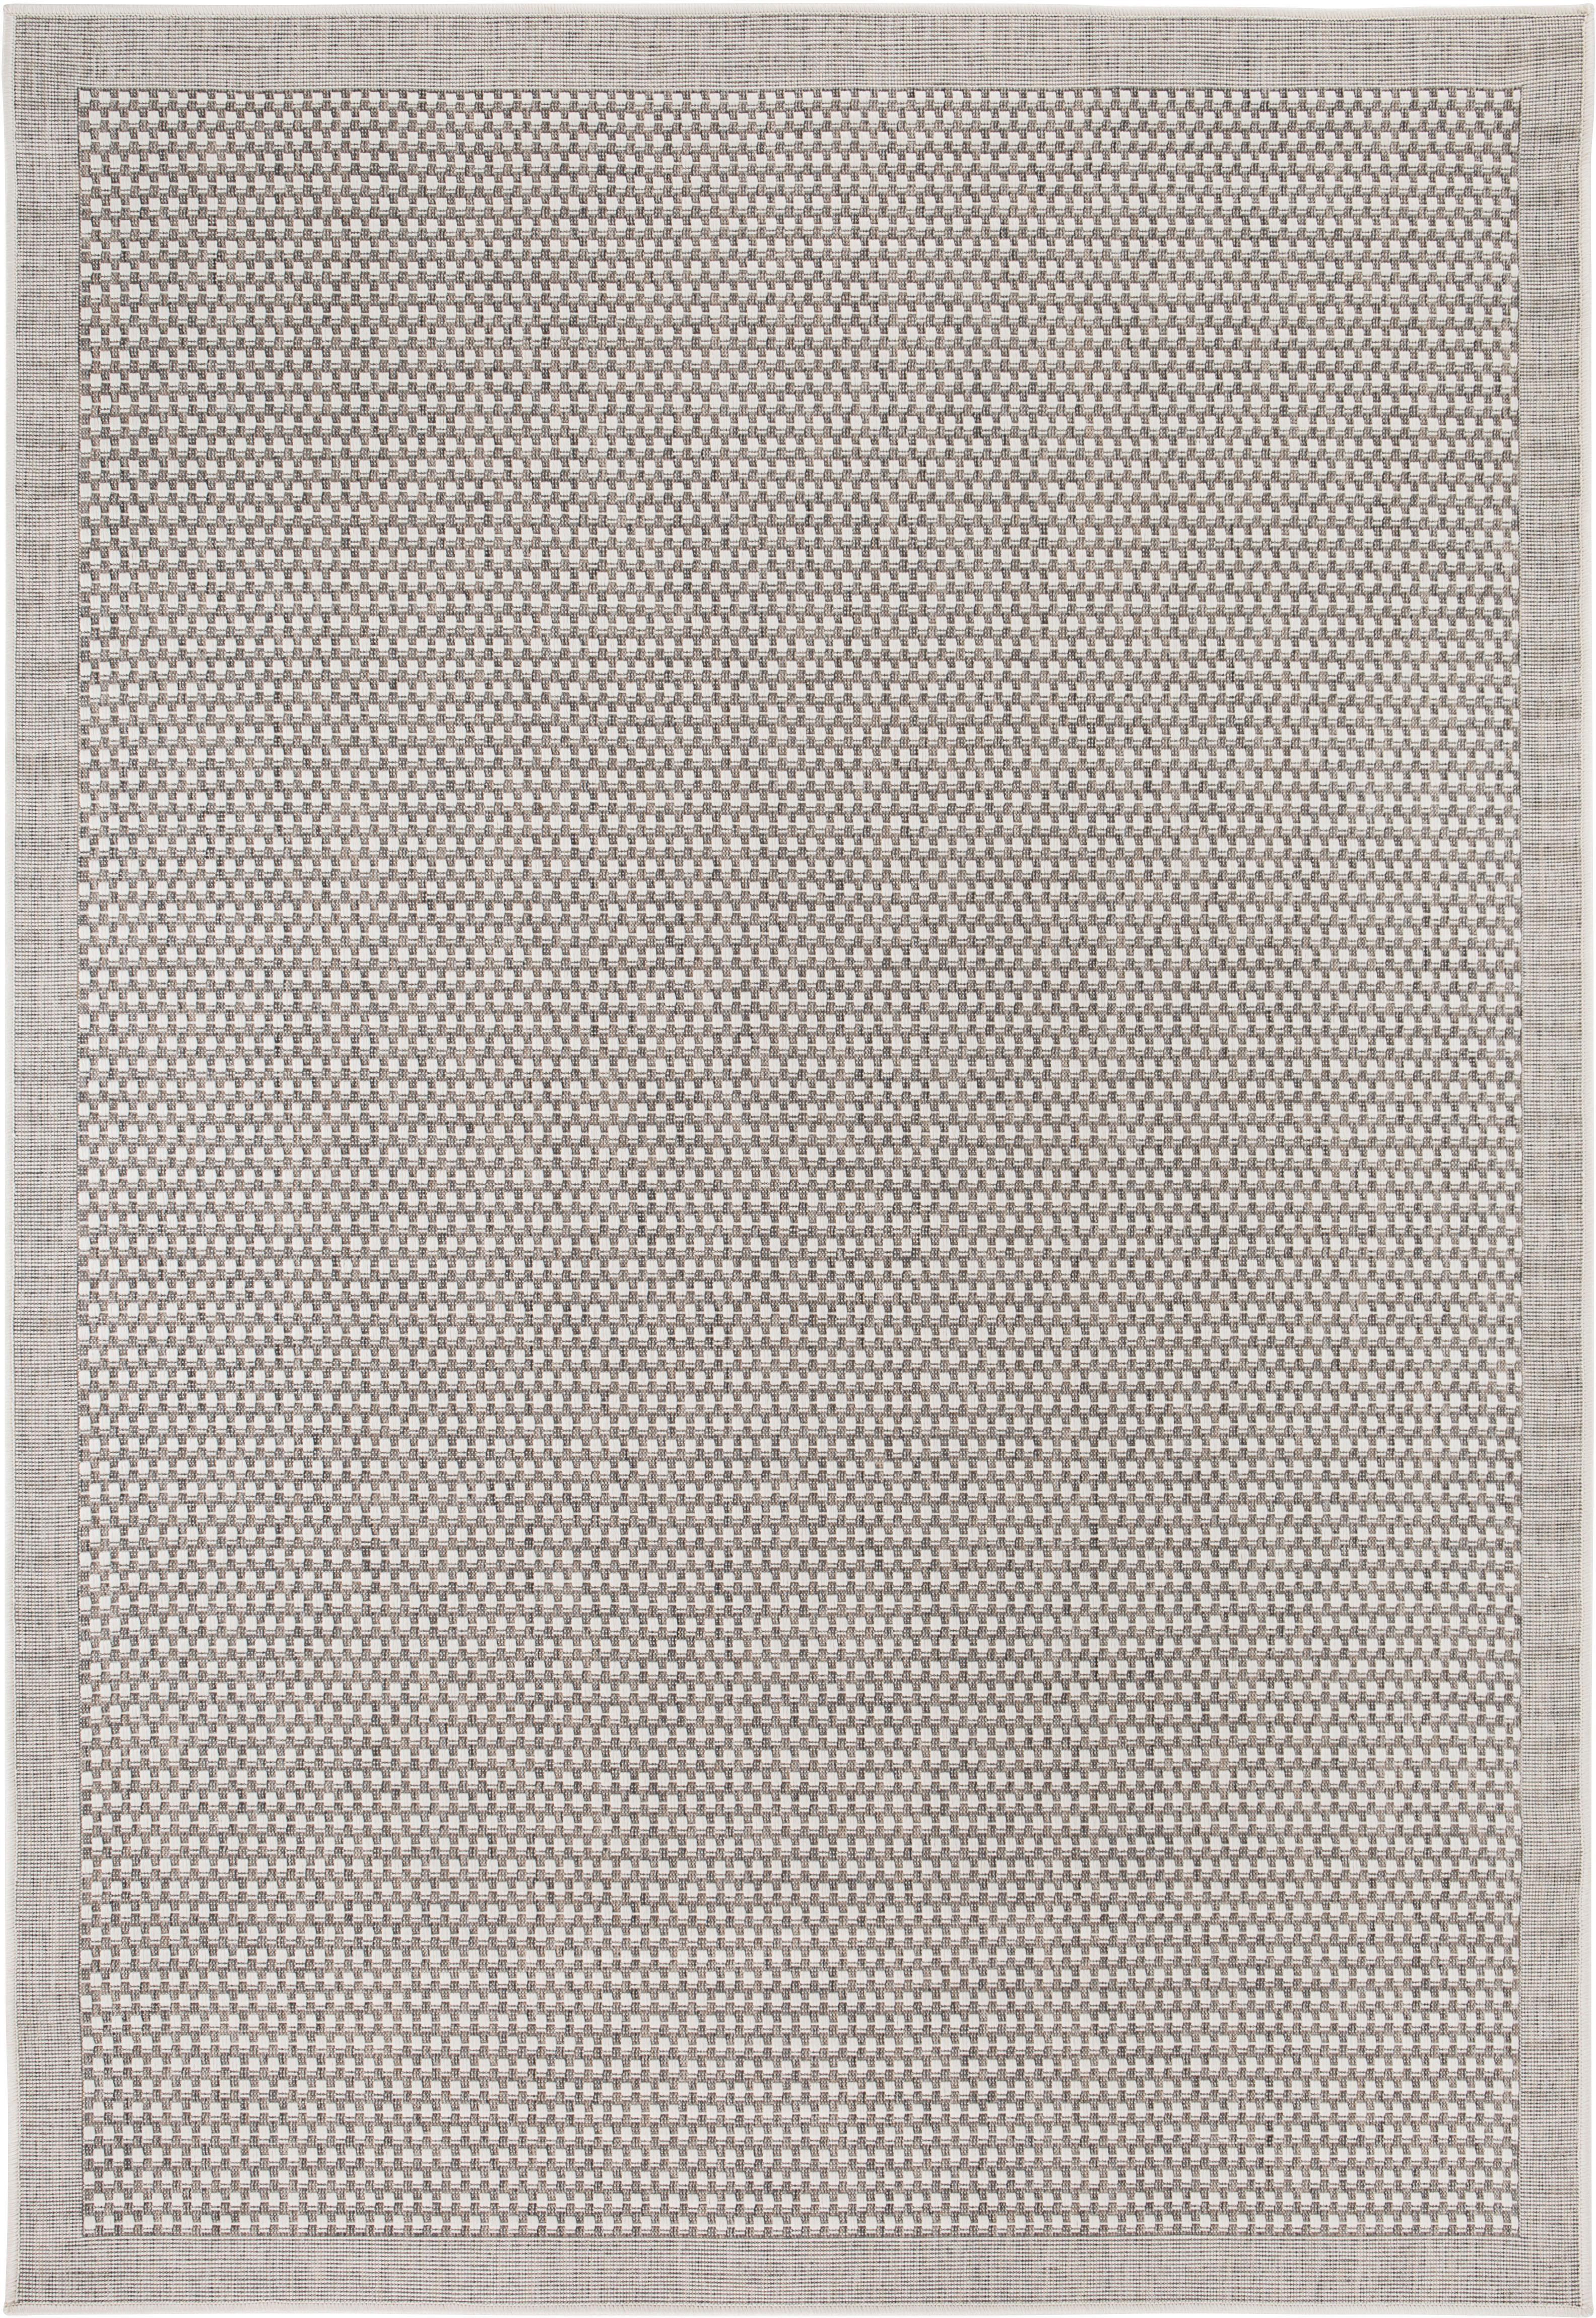 Teppich, »Savannah«, Andiamo, rechteckig, Höhe 5 mm, maschinell gewebt | Heimtextilien > Teppiche > Sonstige-Teppiche | Braun | ANDIAMO